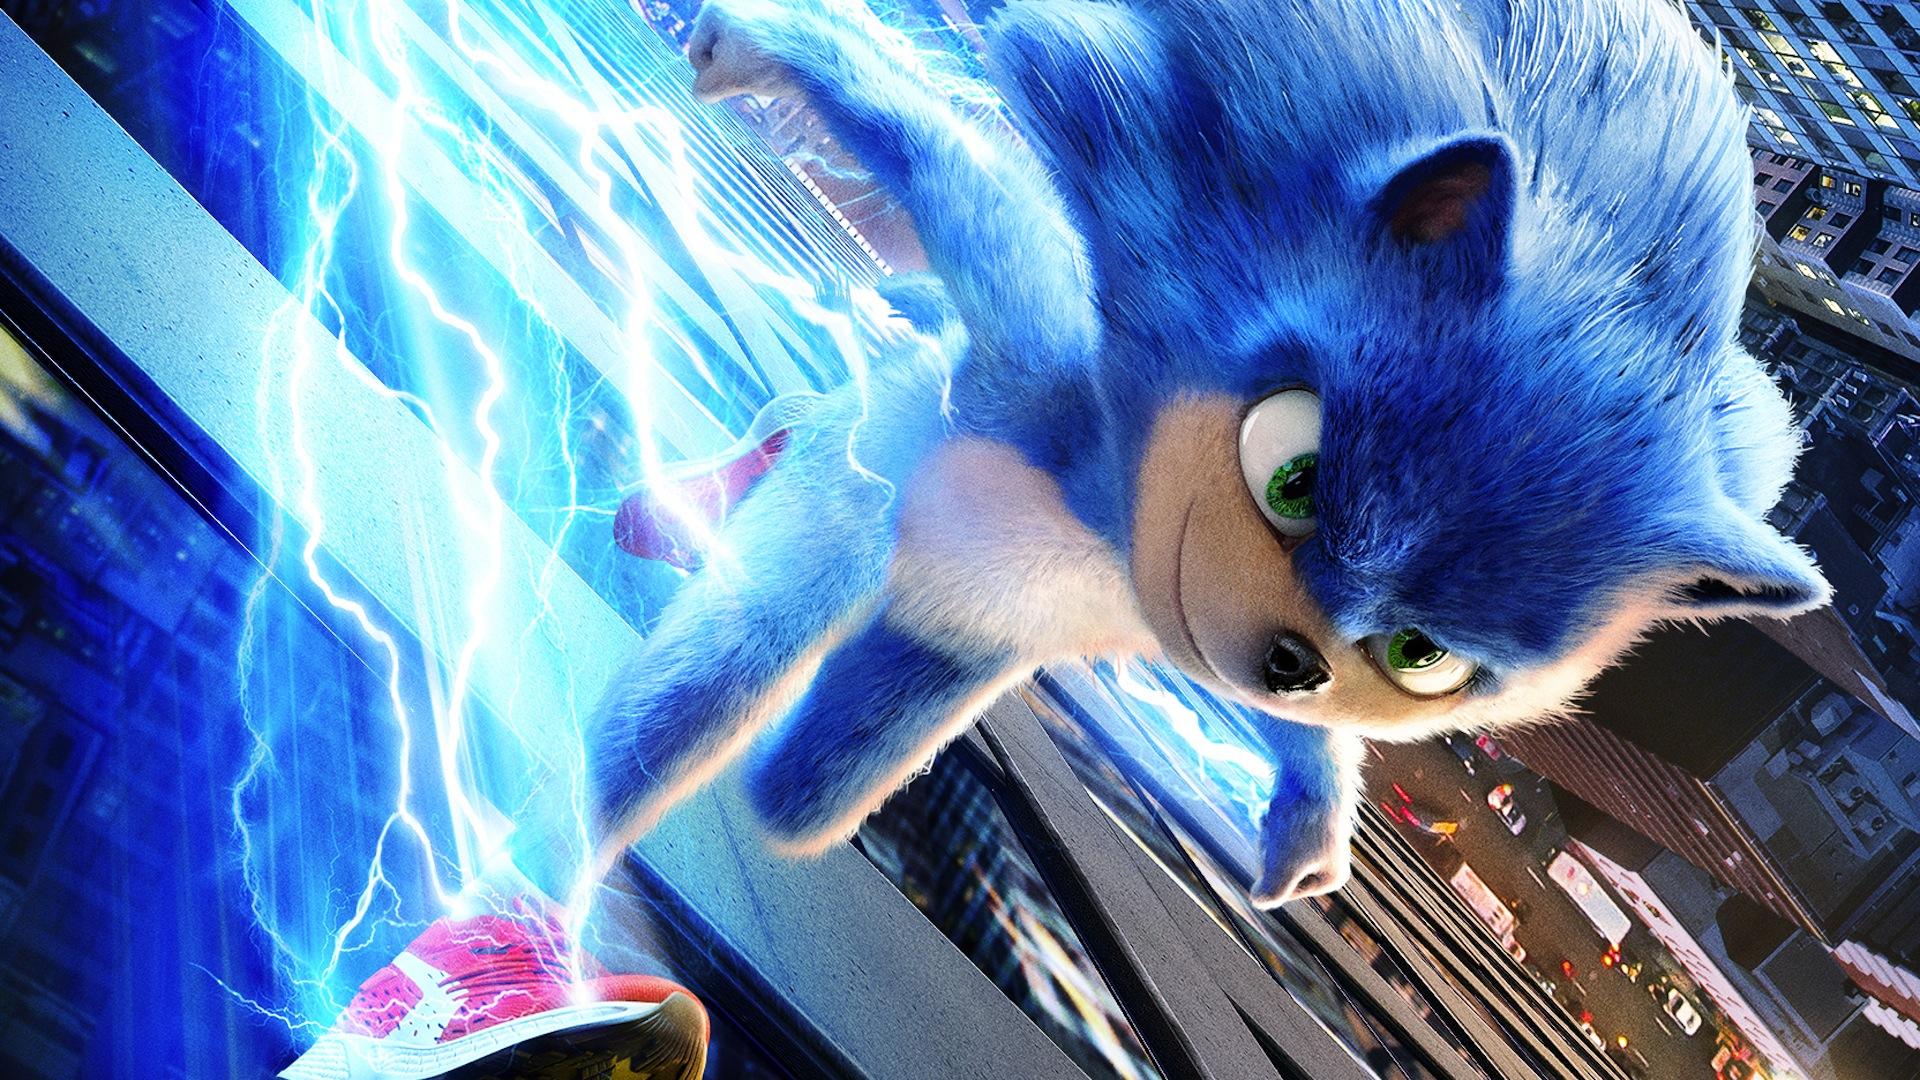 19] Sonic The Hedgehog Movie 2019 Wallpapers on WallpaperSafari 1920x1080